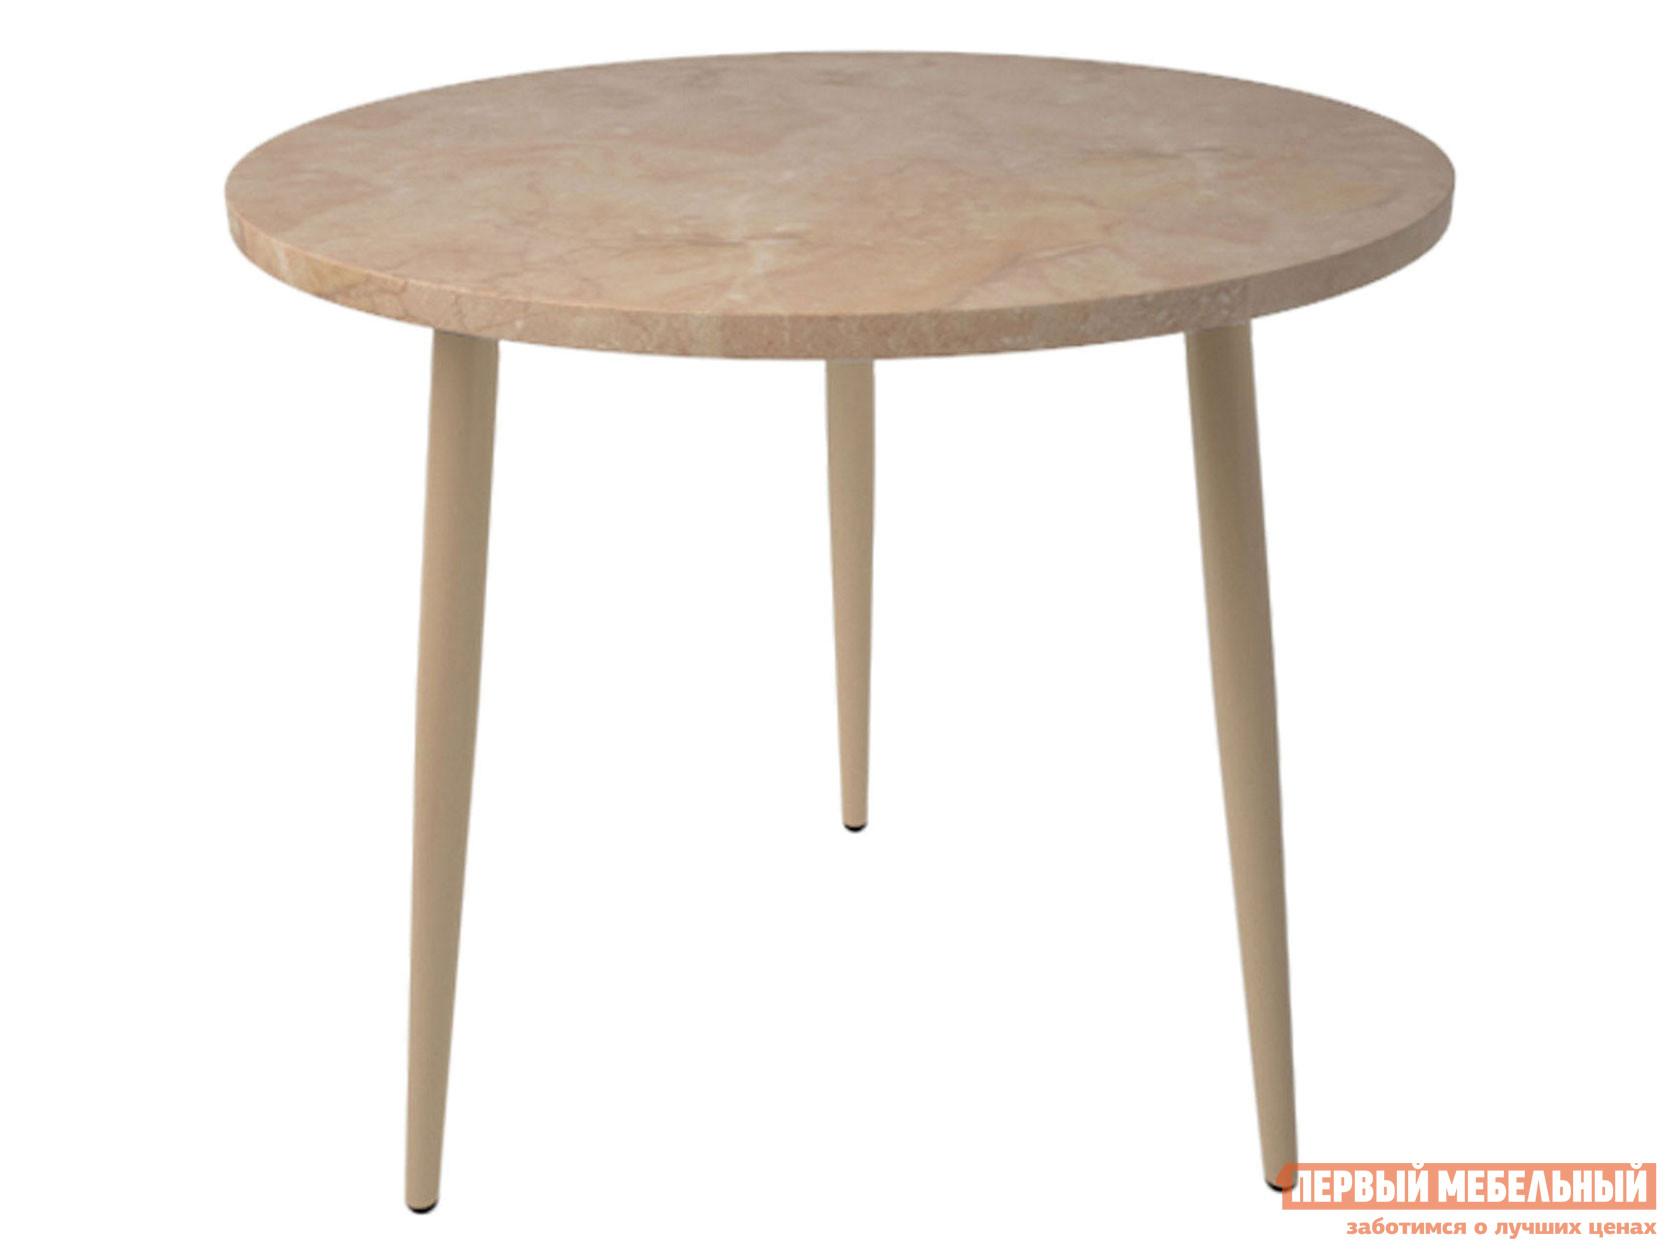 Кухонный стол  Брайт Валенсия / Серо-бежевый, металл Мебвилл 124115